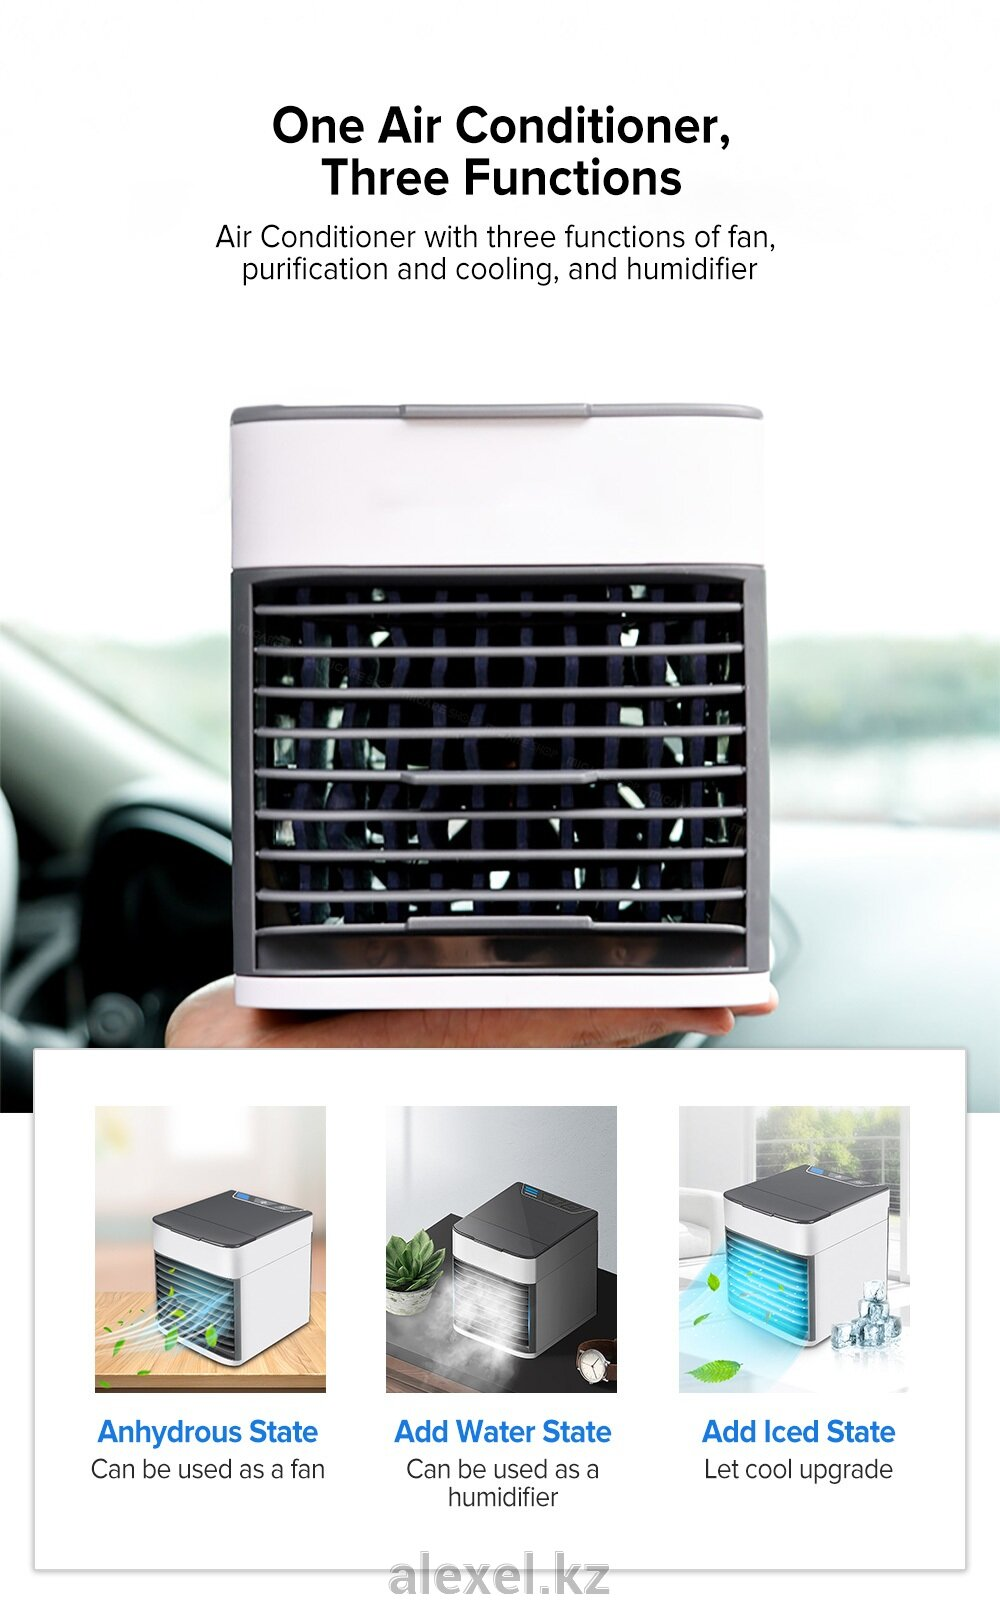 Охладитель воздуха кондиционер USB Arctic Air Ultra 2X - фото pic_716b7f2ad384f6f8ef74d148dd9c478d_1920x9000_1.jpg